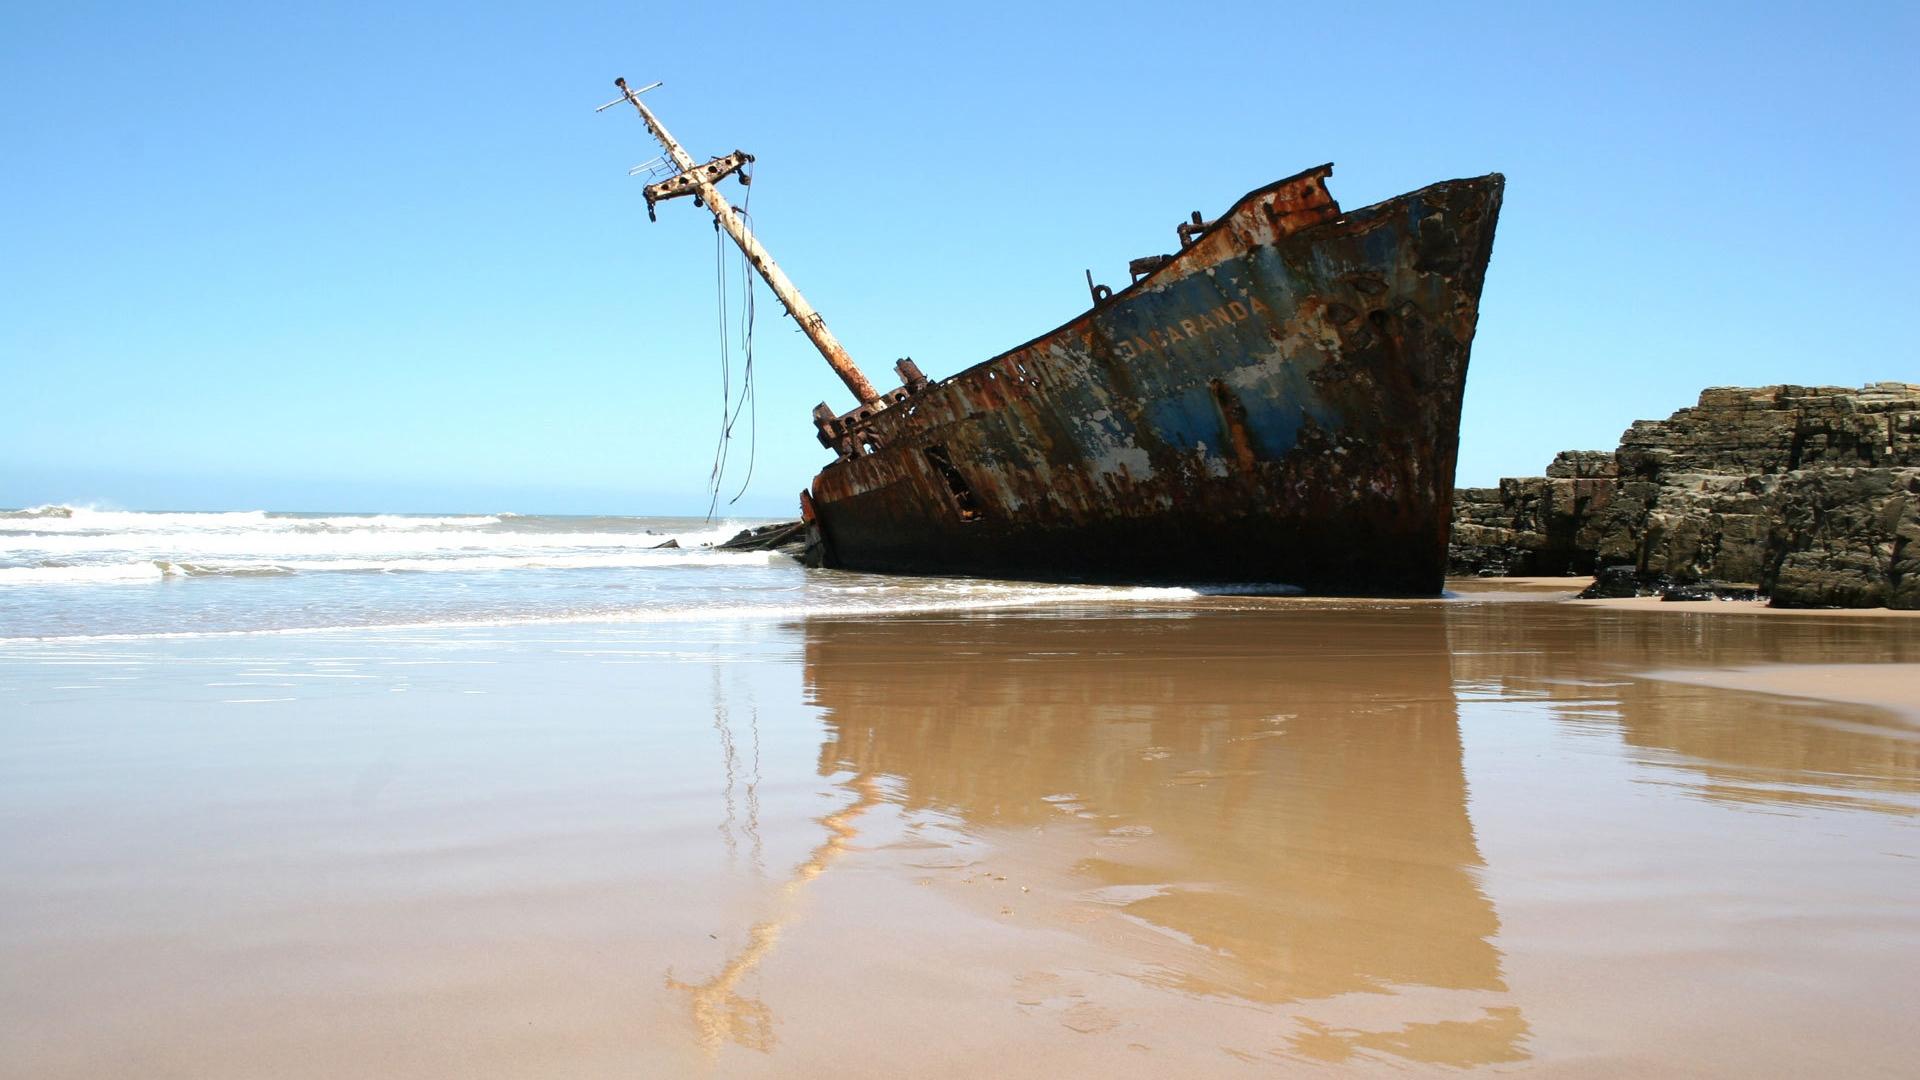 Wallpaper download mast - Download Wallpaper 1920x1080 Ship Fragments Rust Mast Coast Beach Full Hd 1080p Hd Background